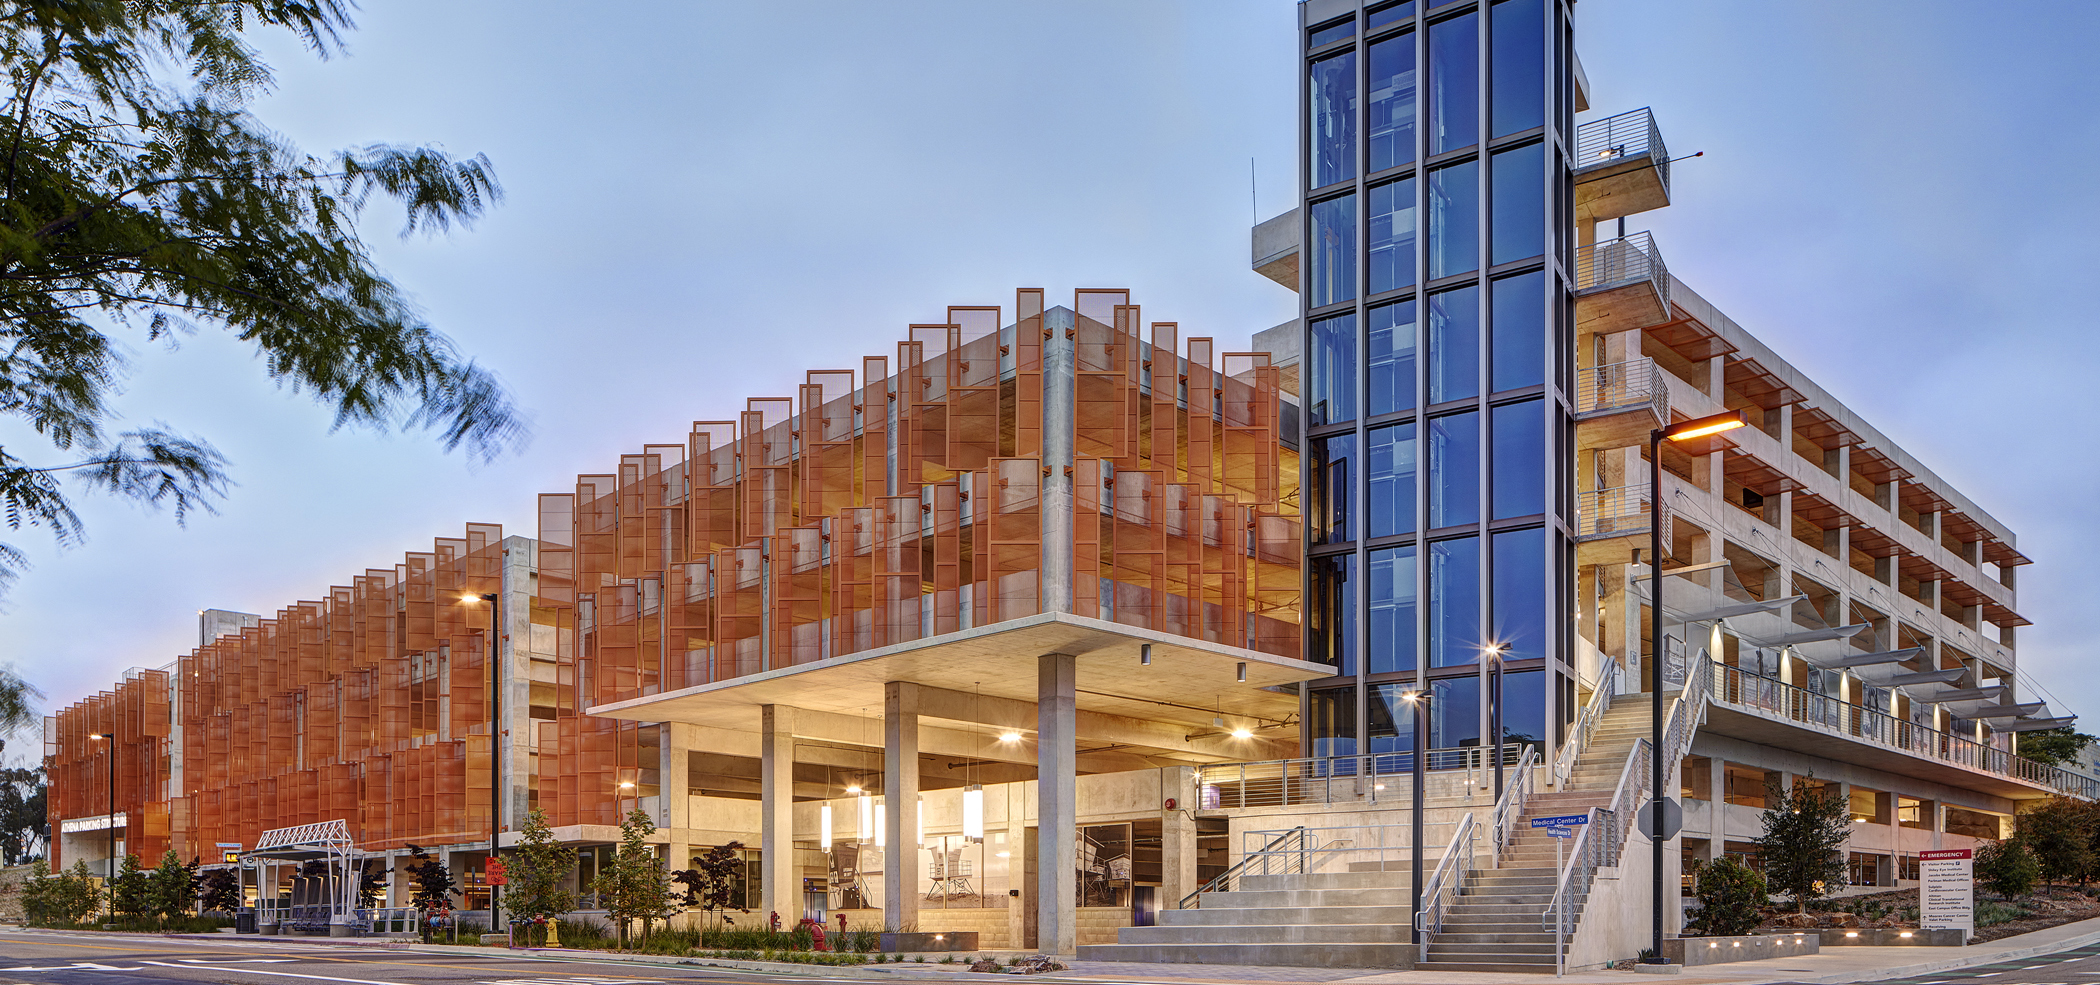 UC San Diego Athena Parking Structure